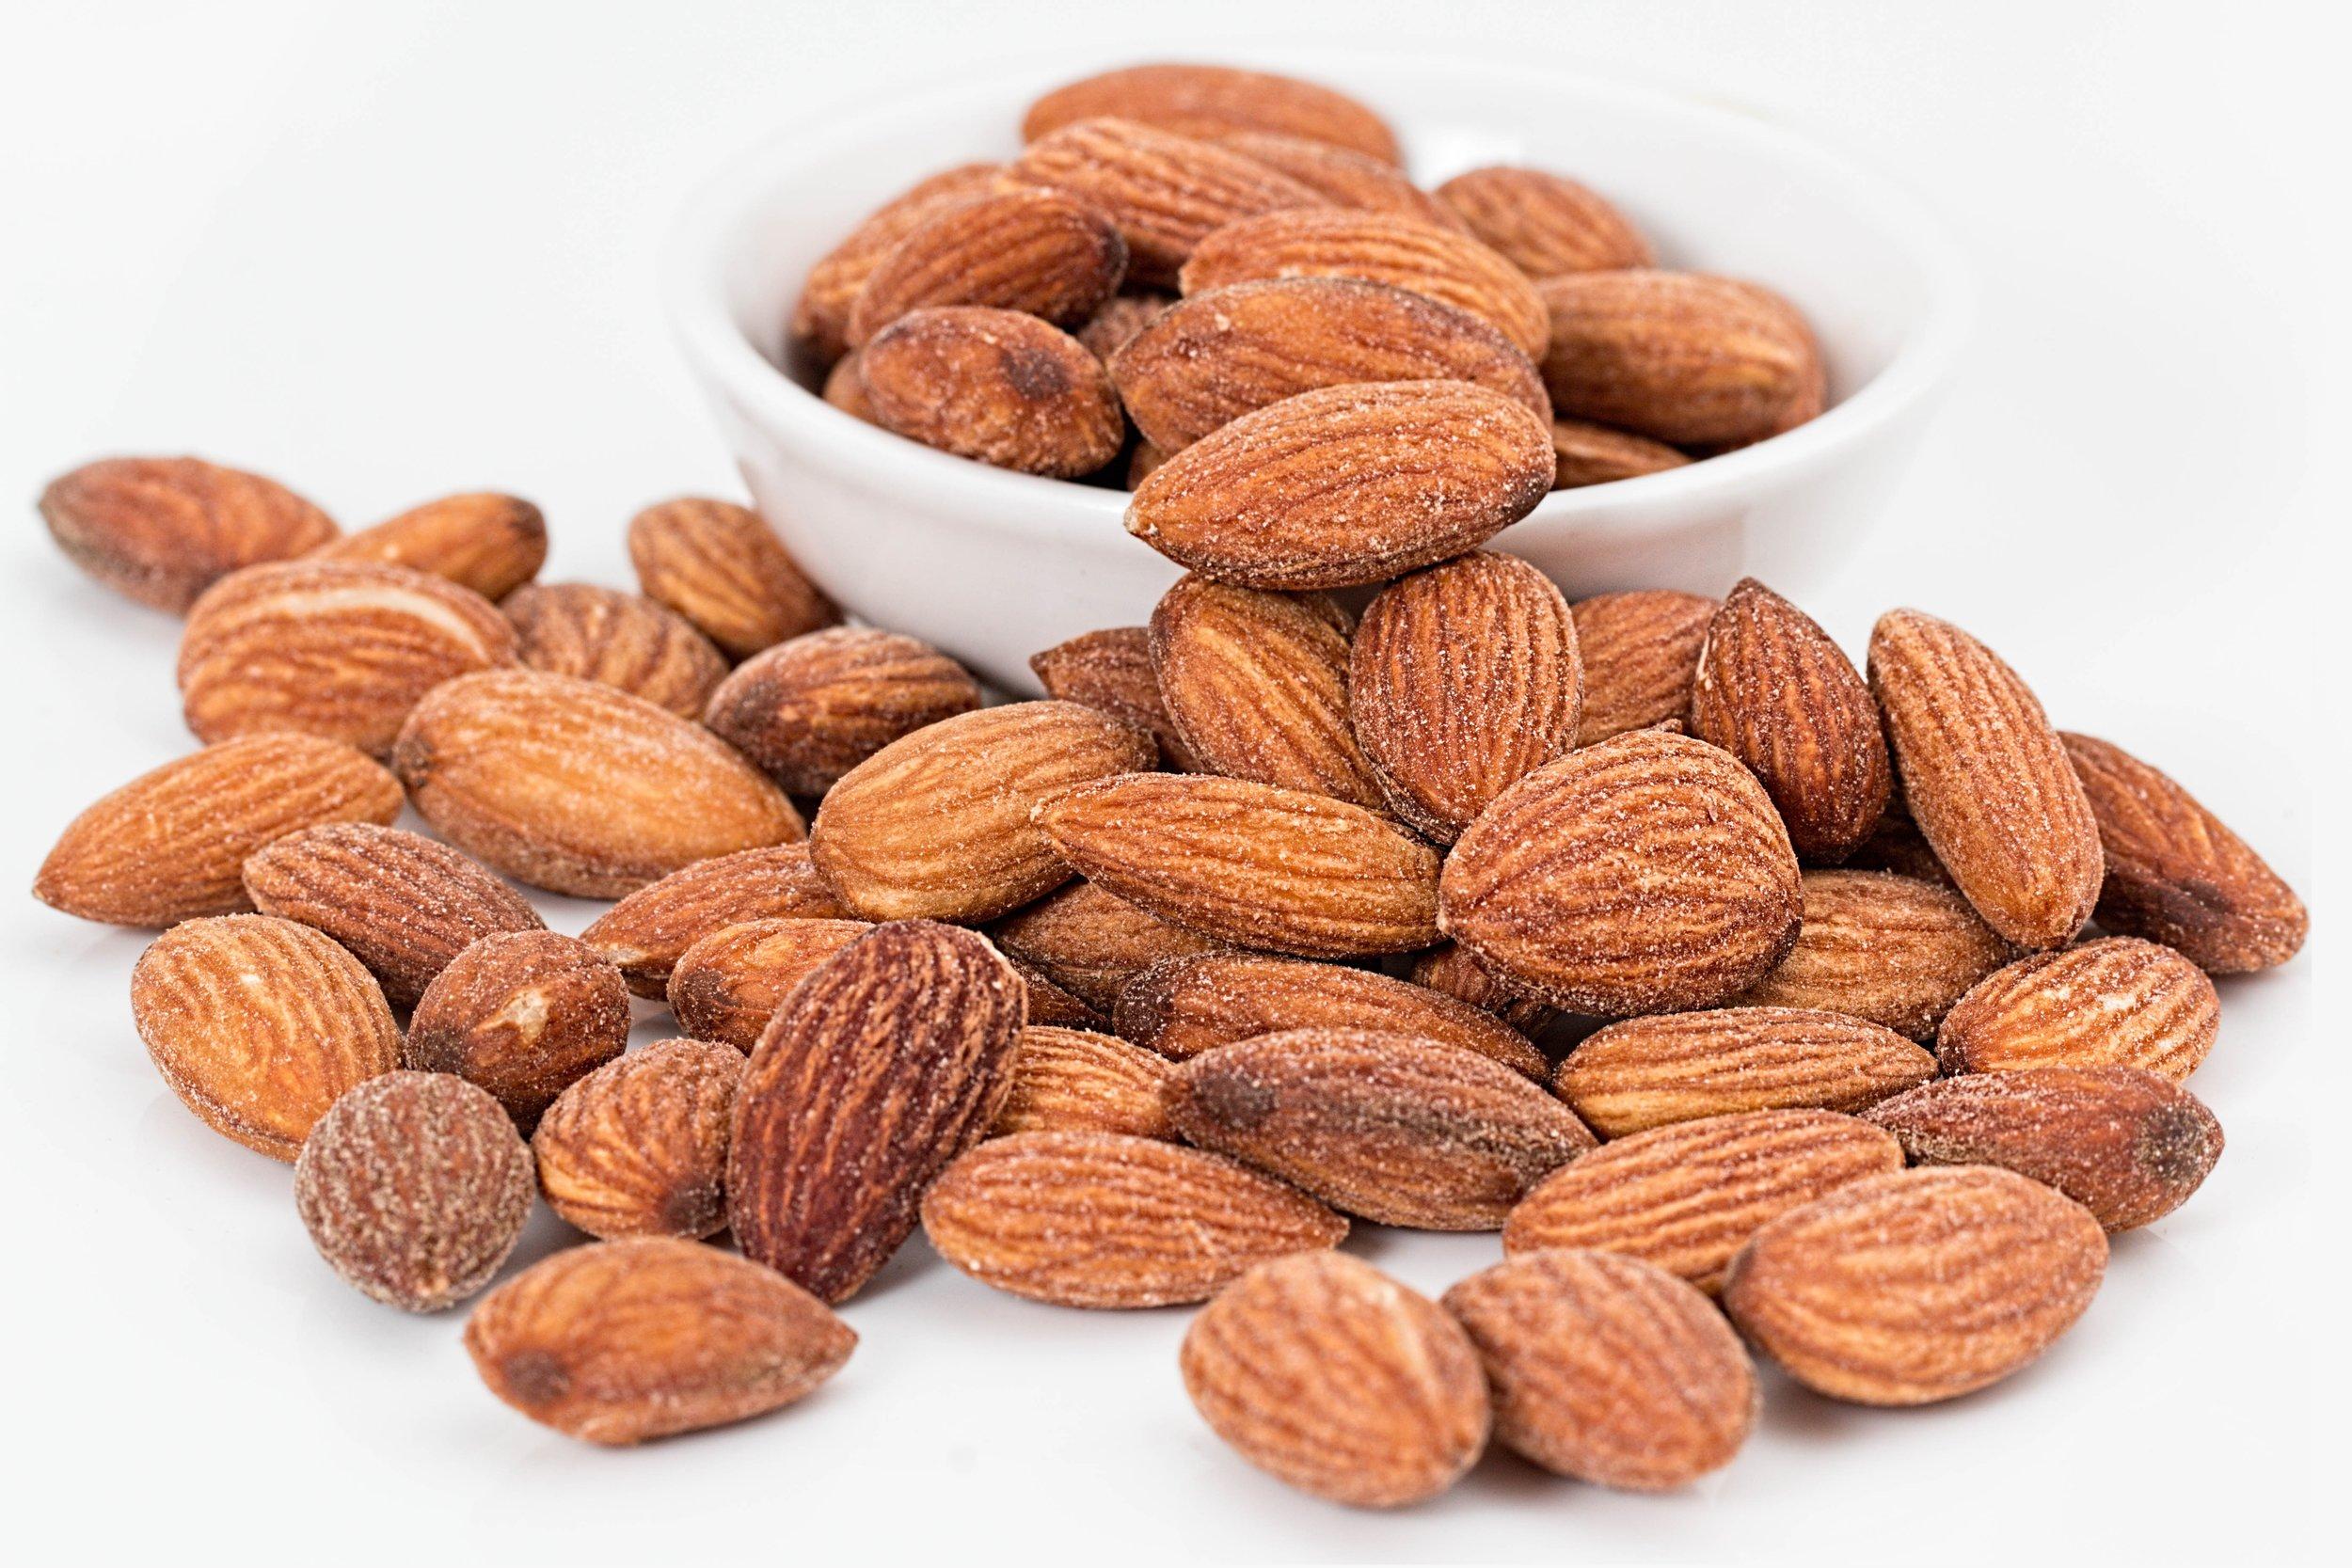 Almonds image by Steve Buissinne .jpg